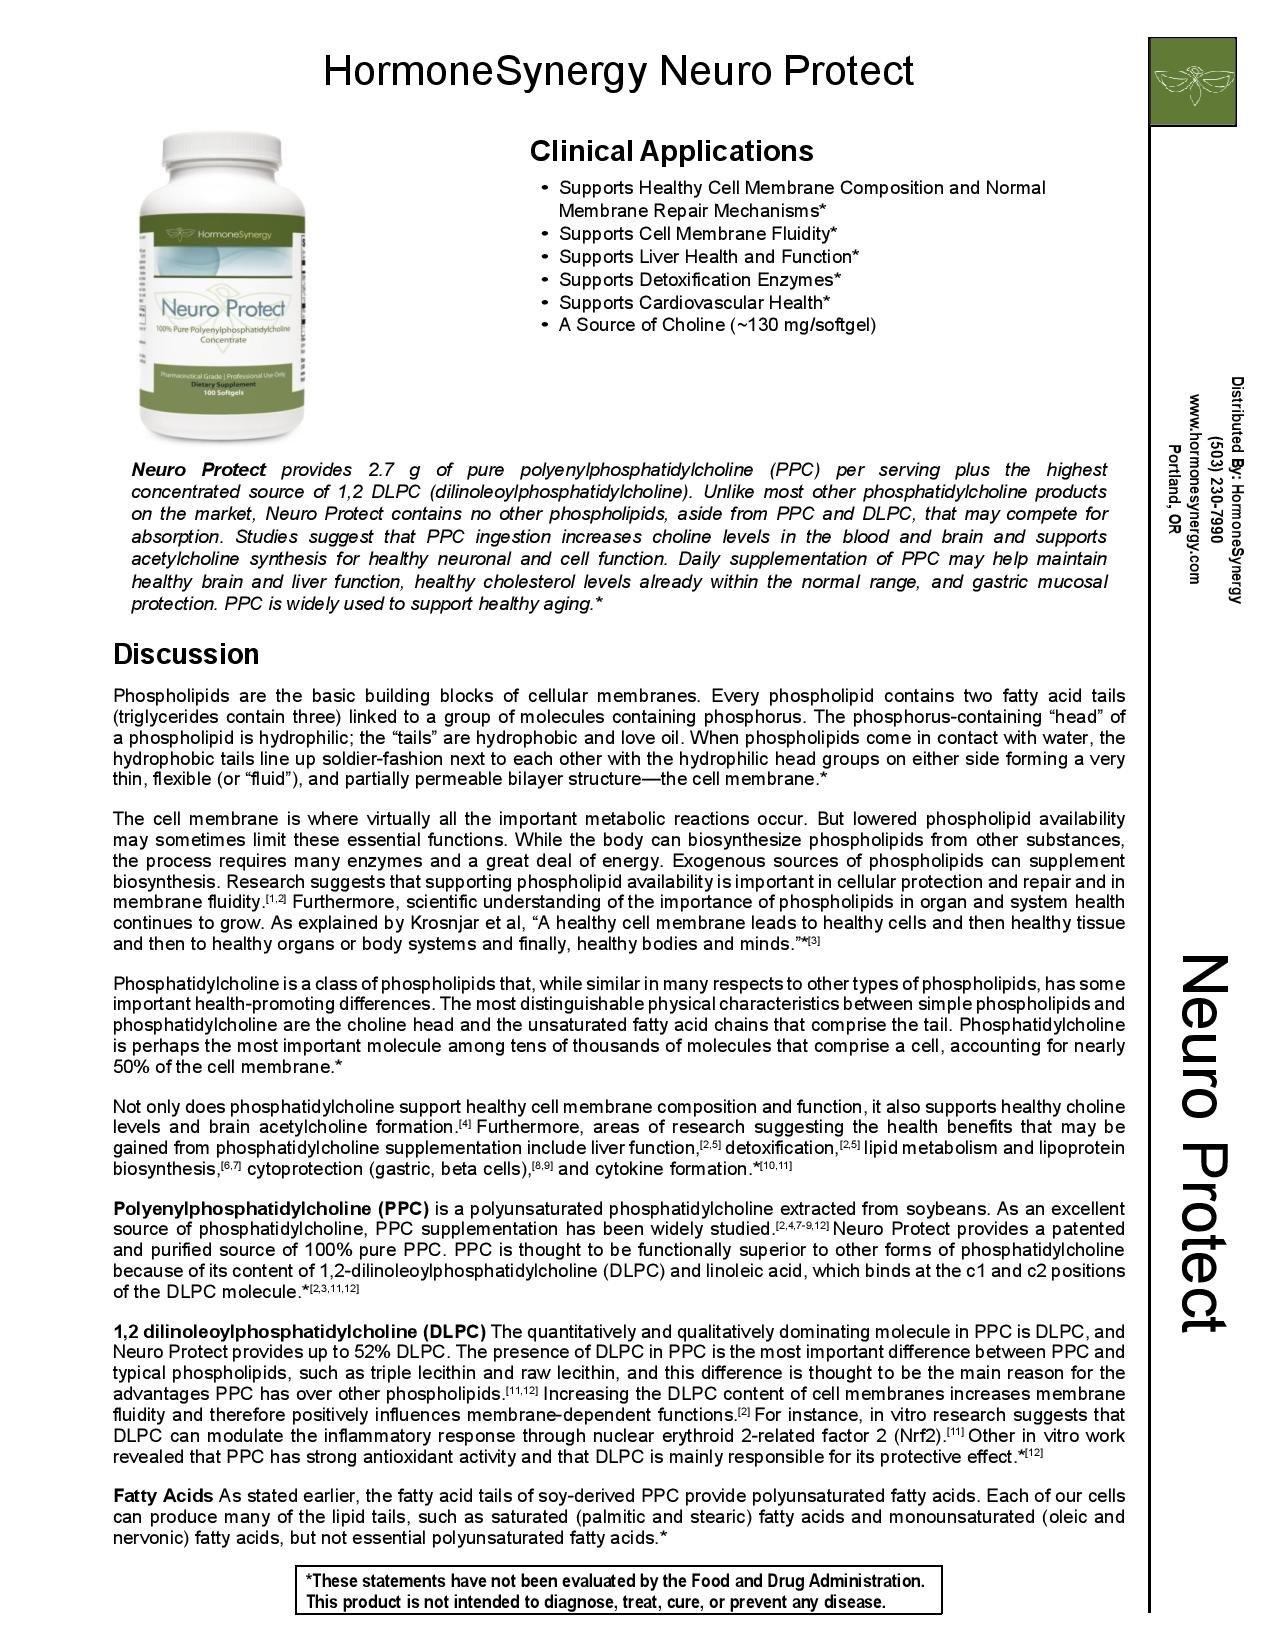 Neuro Protect 100% Pure Polyenyl phosphatidylcholine Concentrate 900mg, 100 ea Softgels (phosphatidyl choline) | by HormoneSynergy (Image #2)